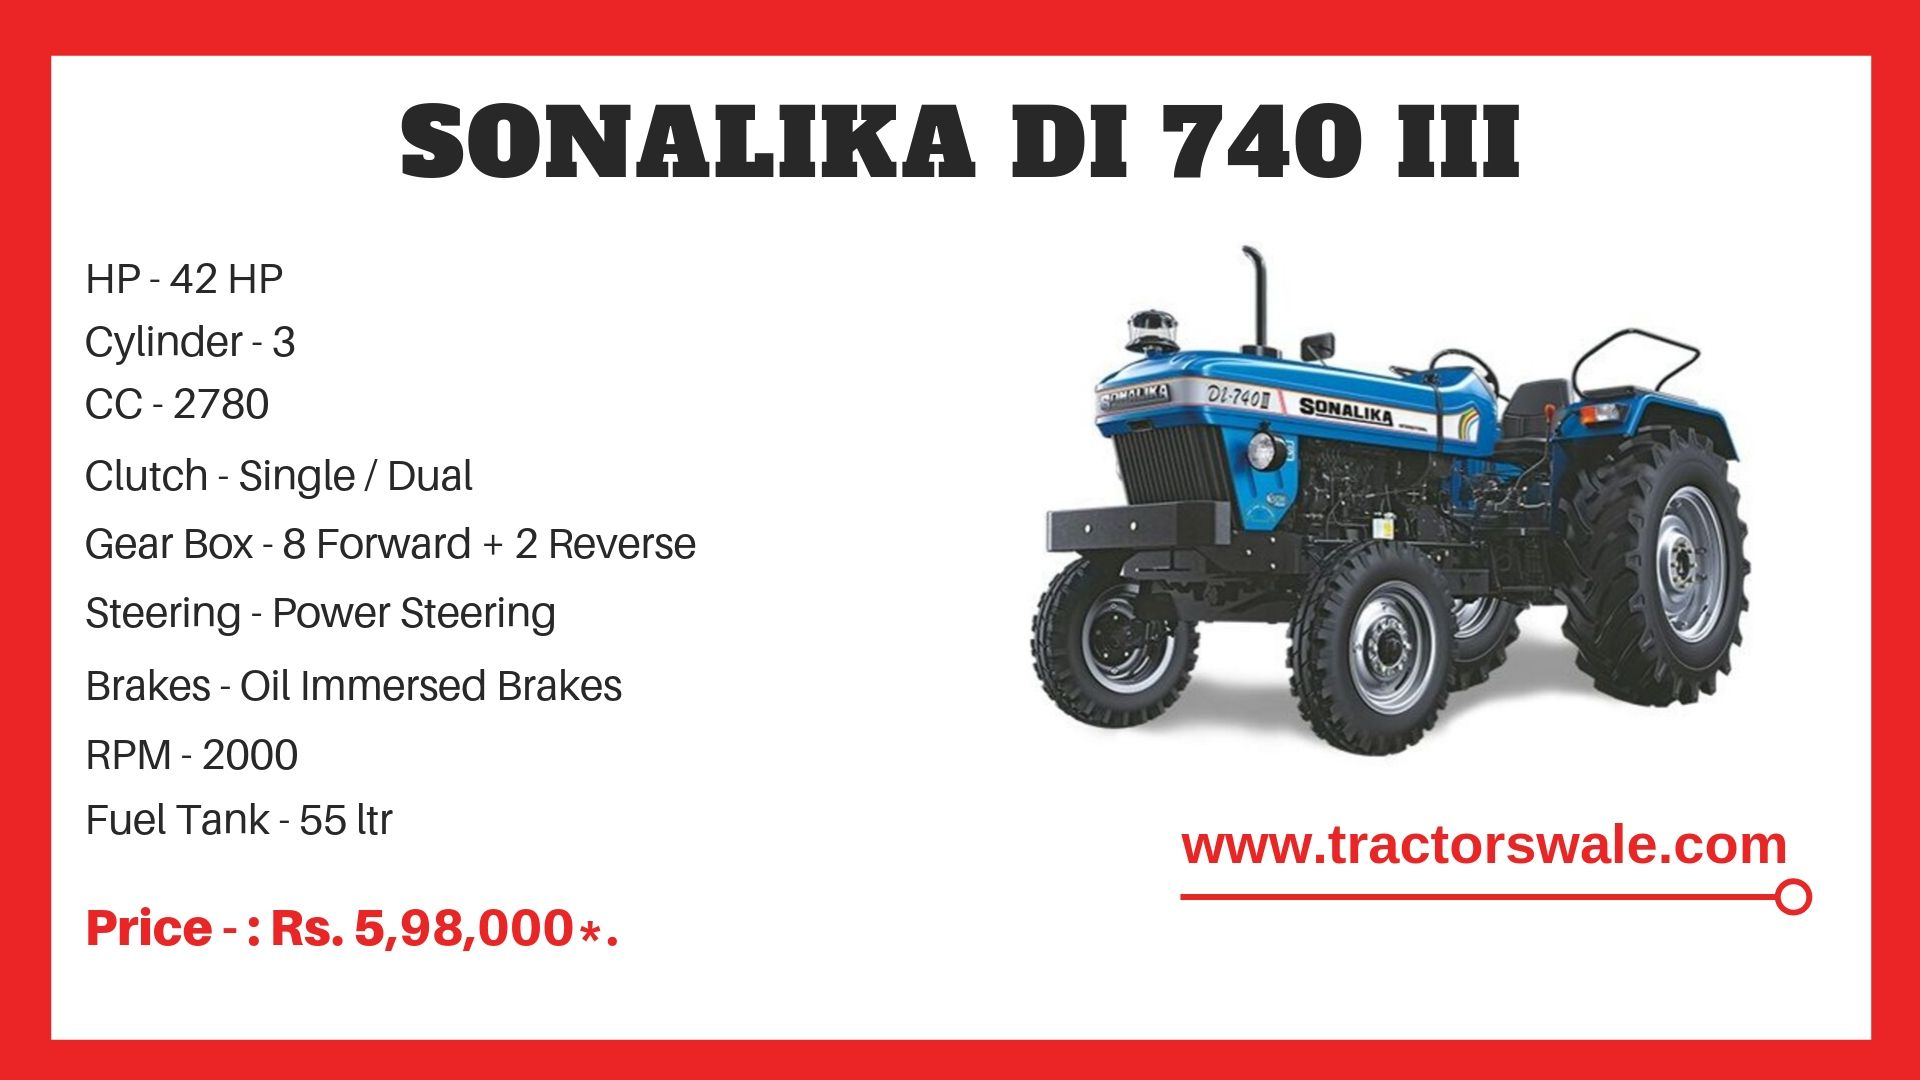 Sonalika DI 740 III tractor specs